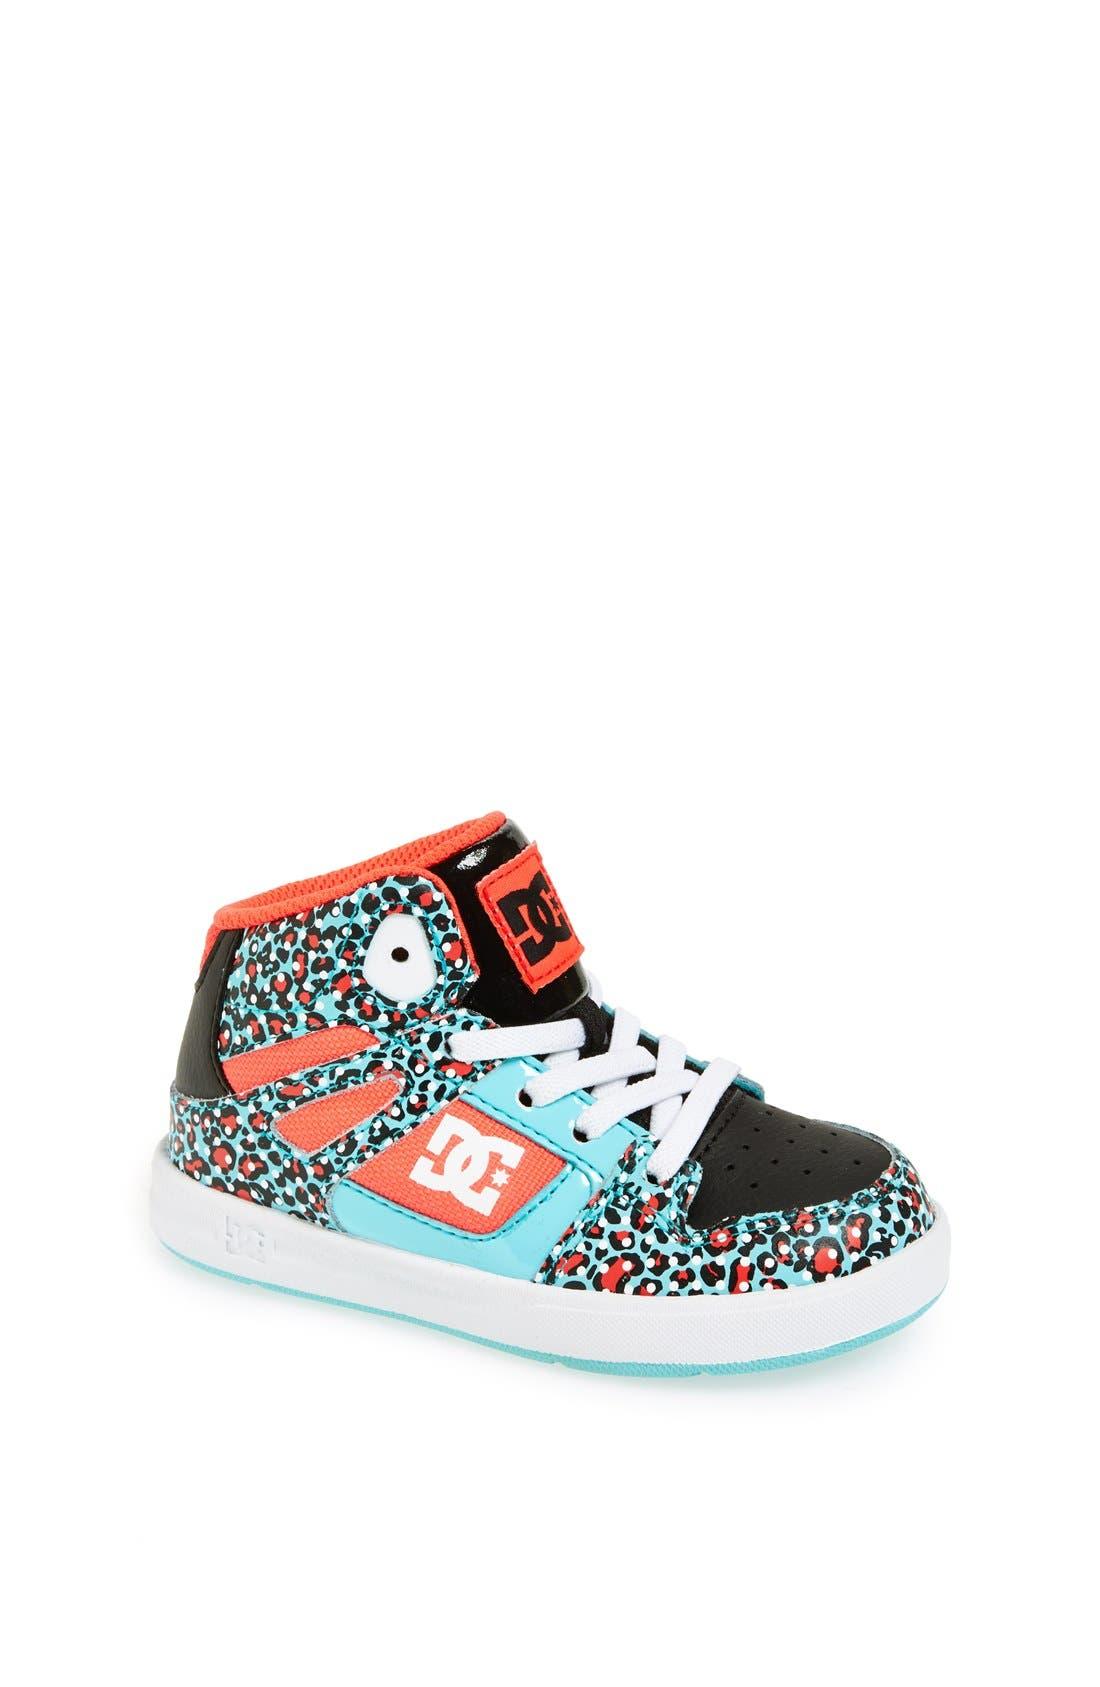 Main Image - DC Shoes 'Rebound' Sneaker (Walker & Toddler)